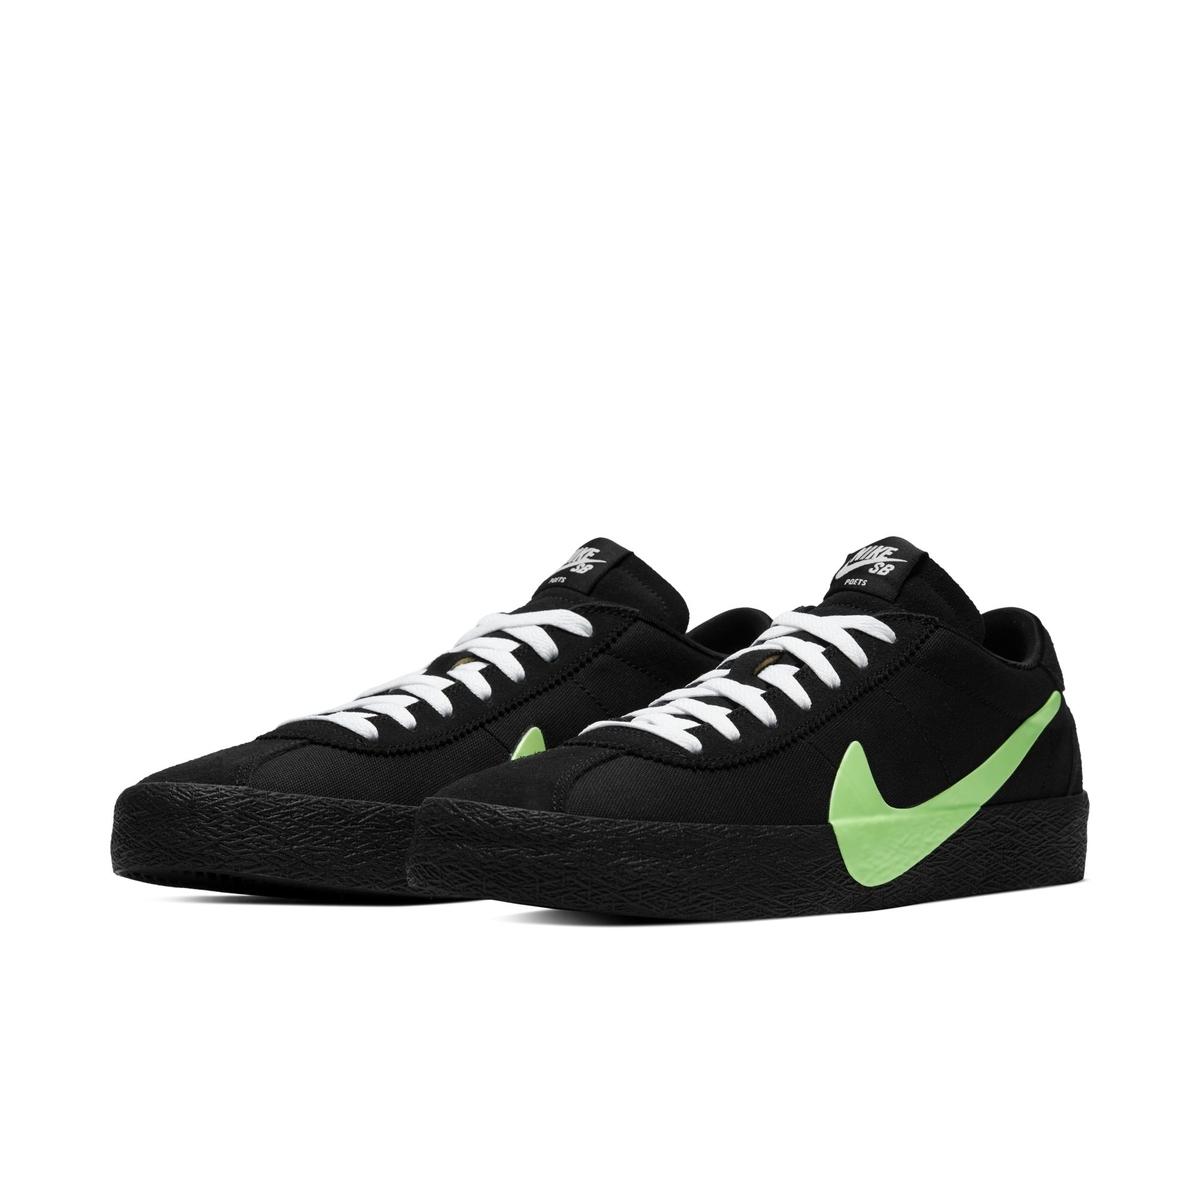 "Gino Iannucci X Nike SB Bruin ""Poets"""